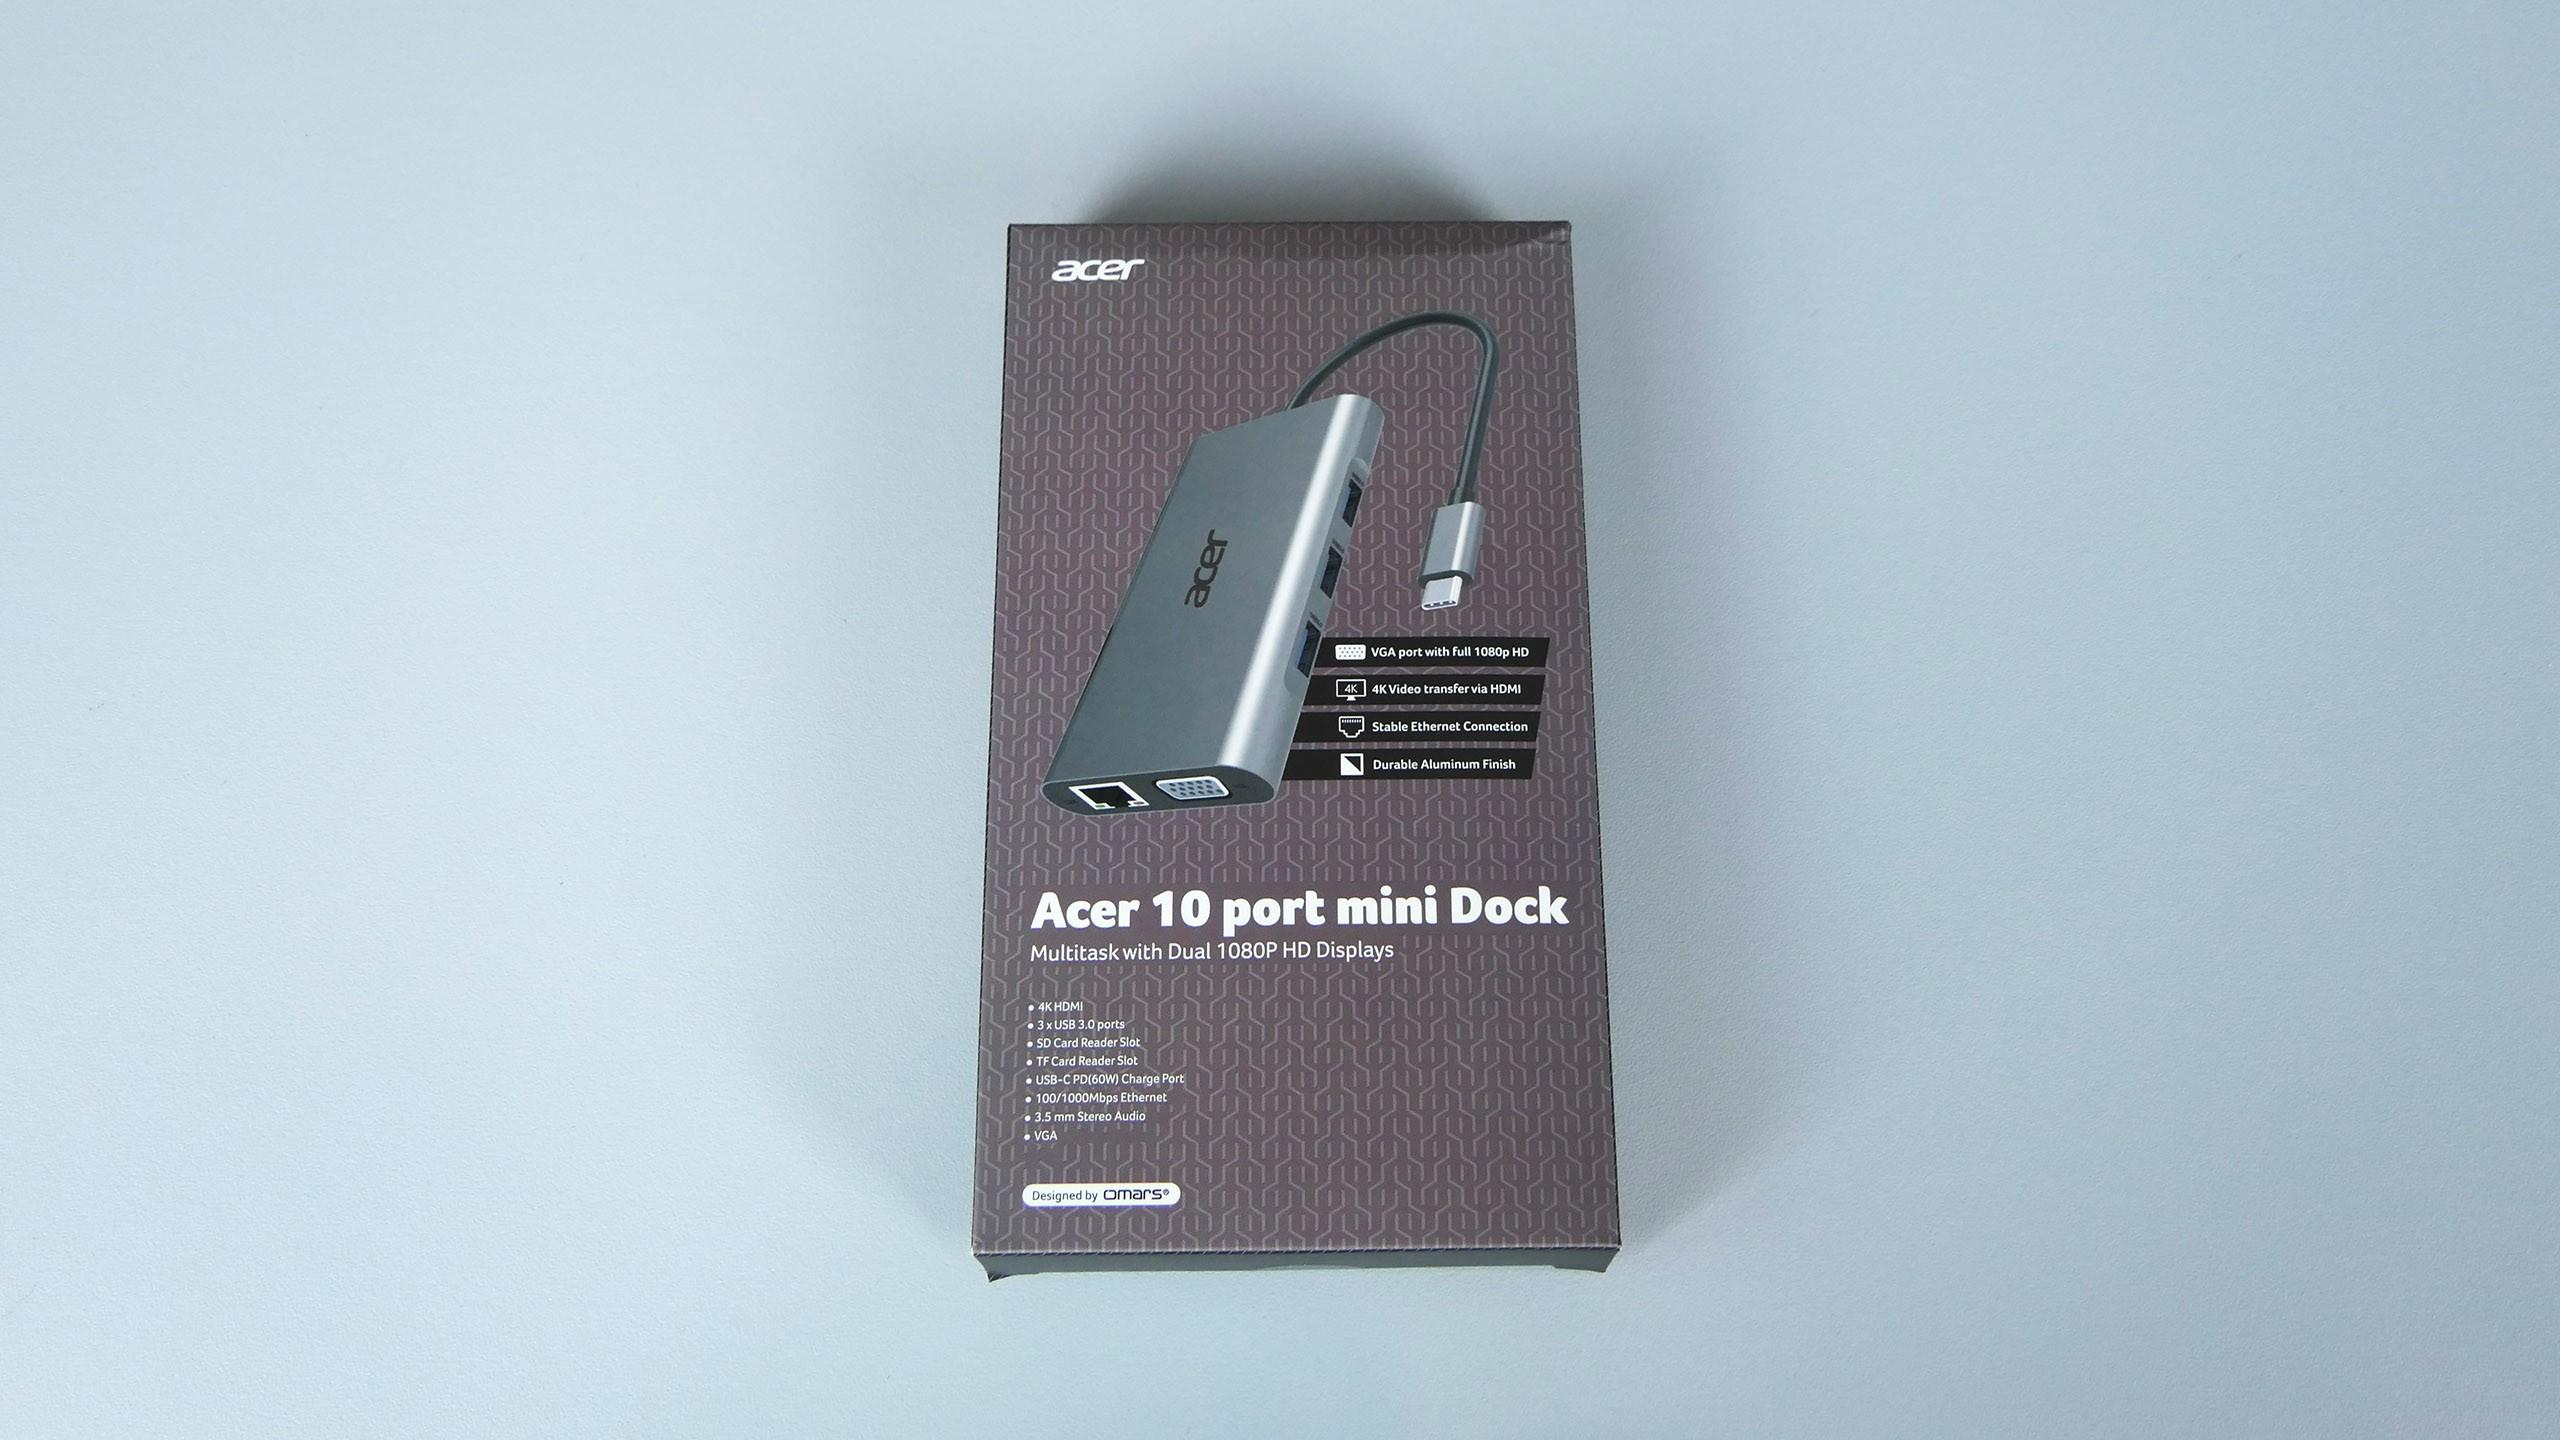 Acer 10 Ports Mini Dock